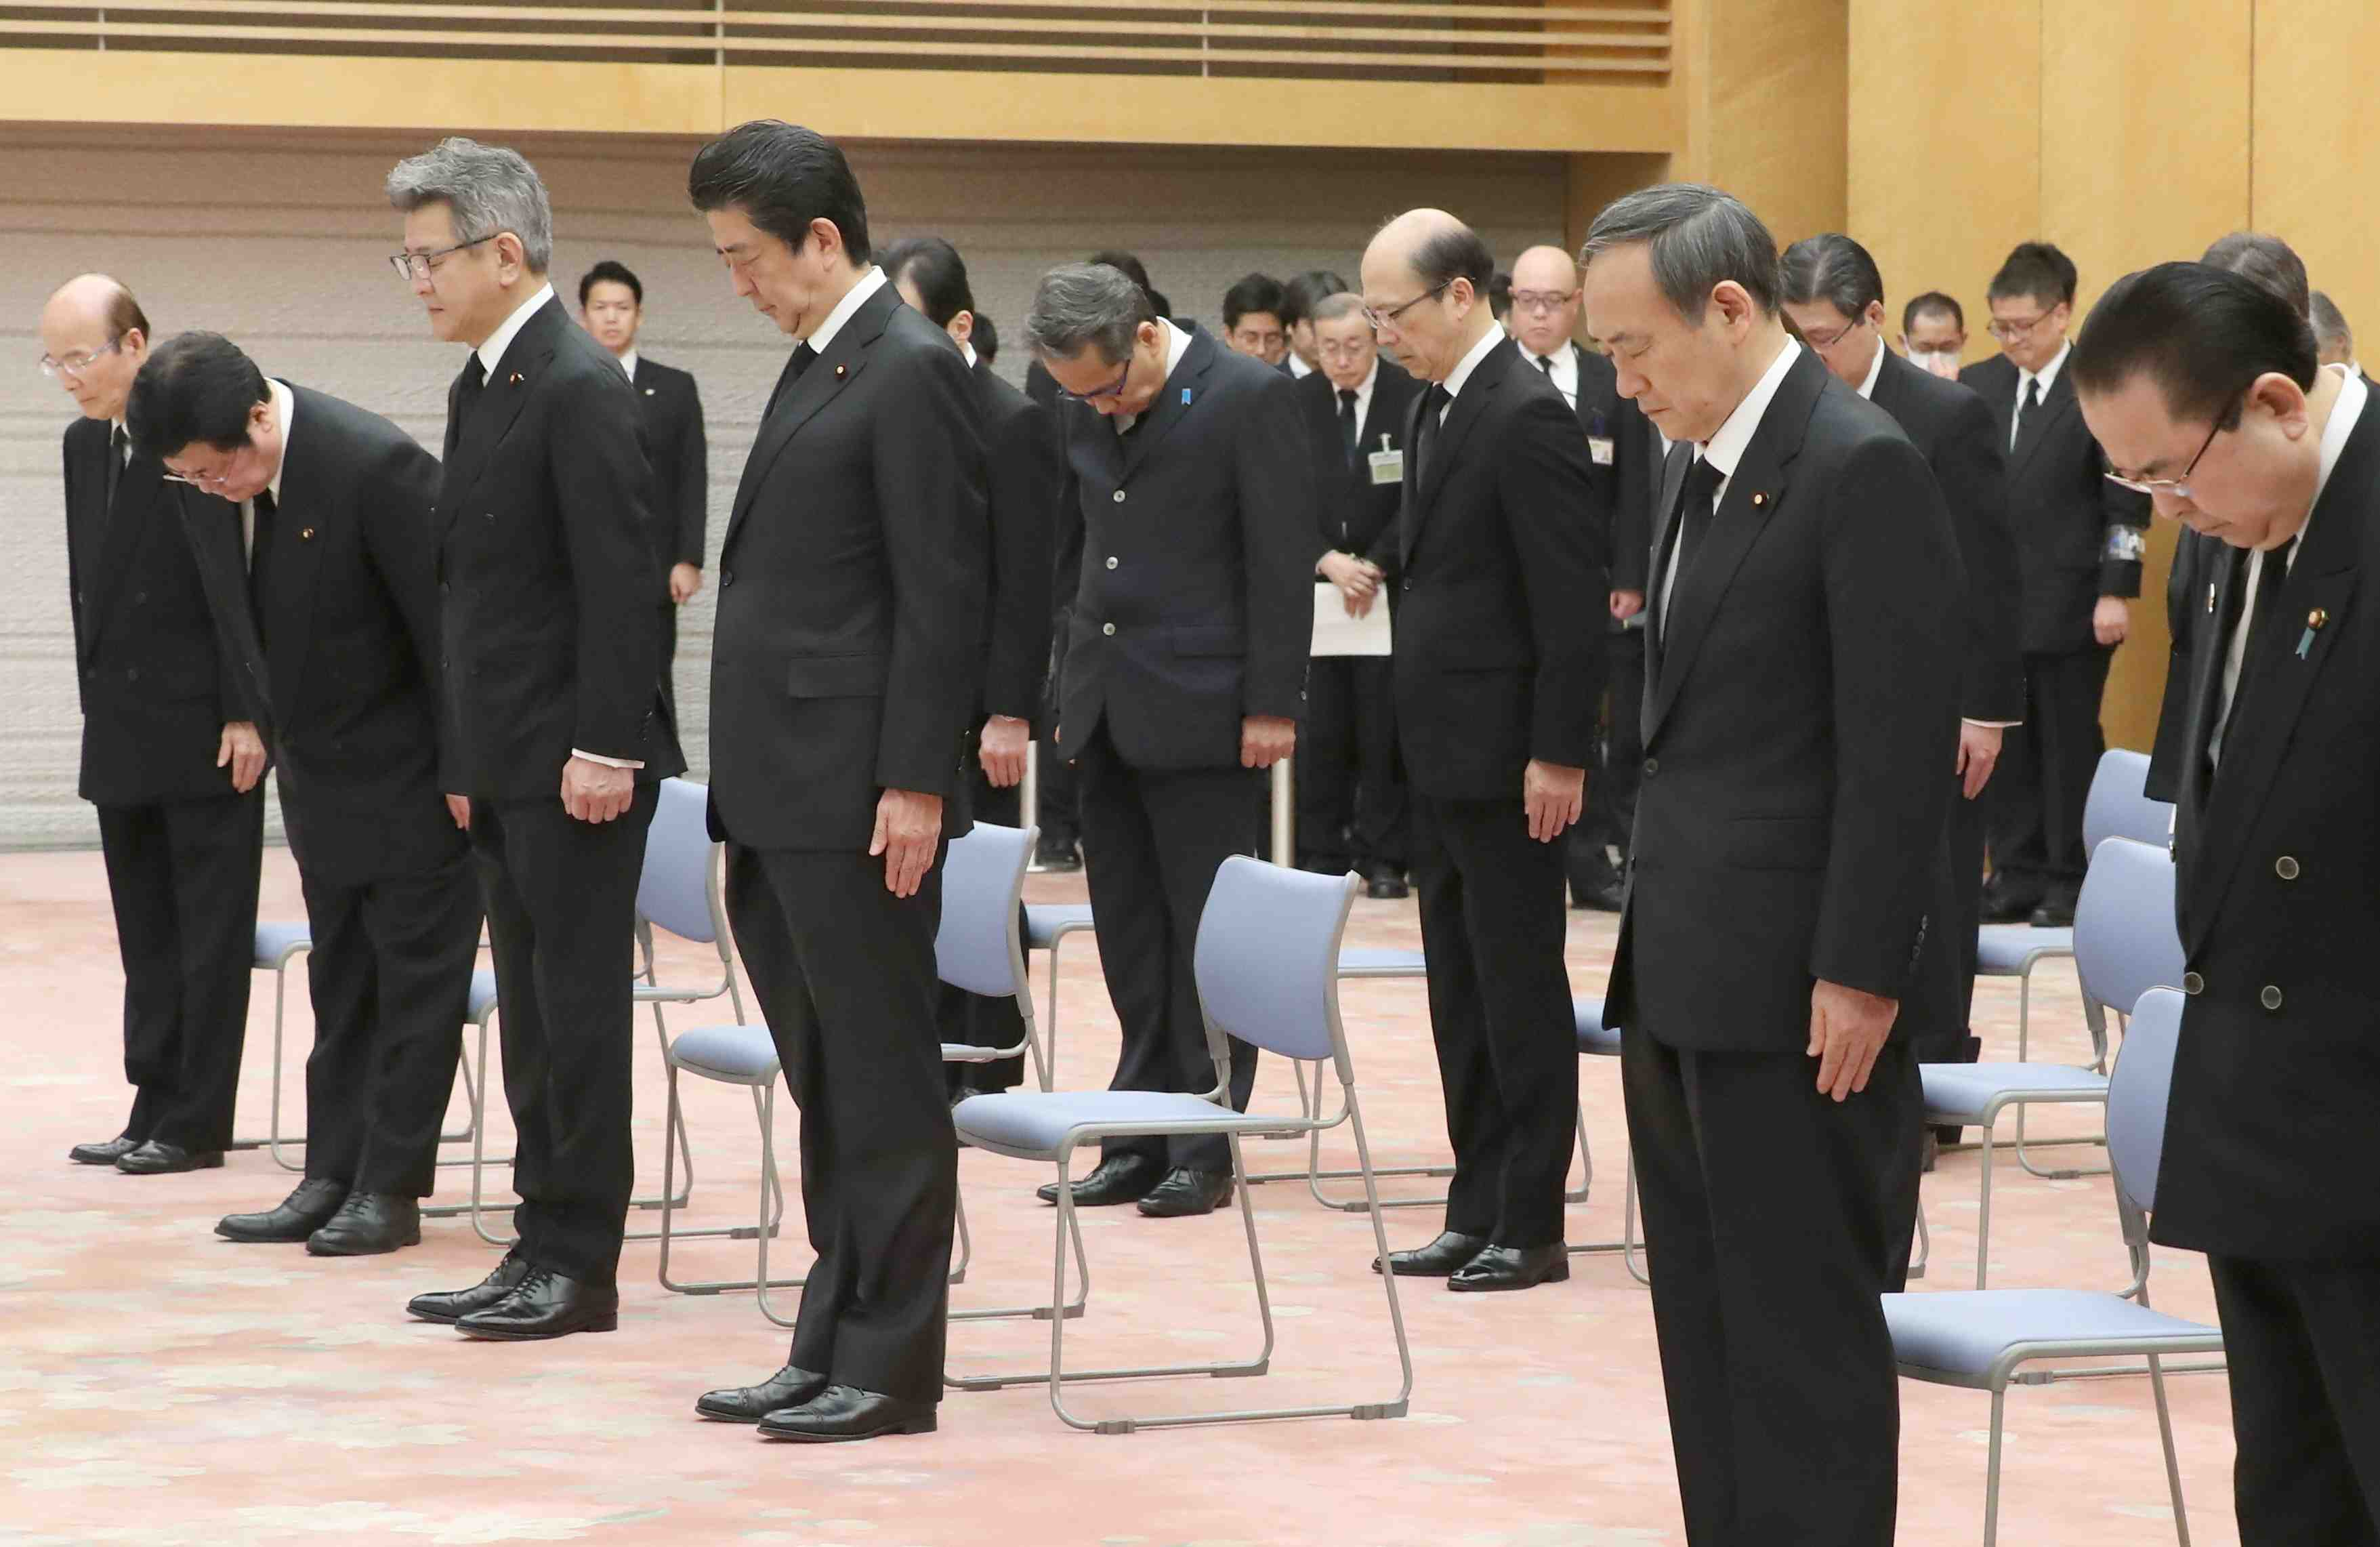 Japan 3.11 Anniversary The Great Tohoku Earthquake 036